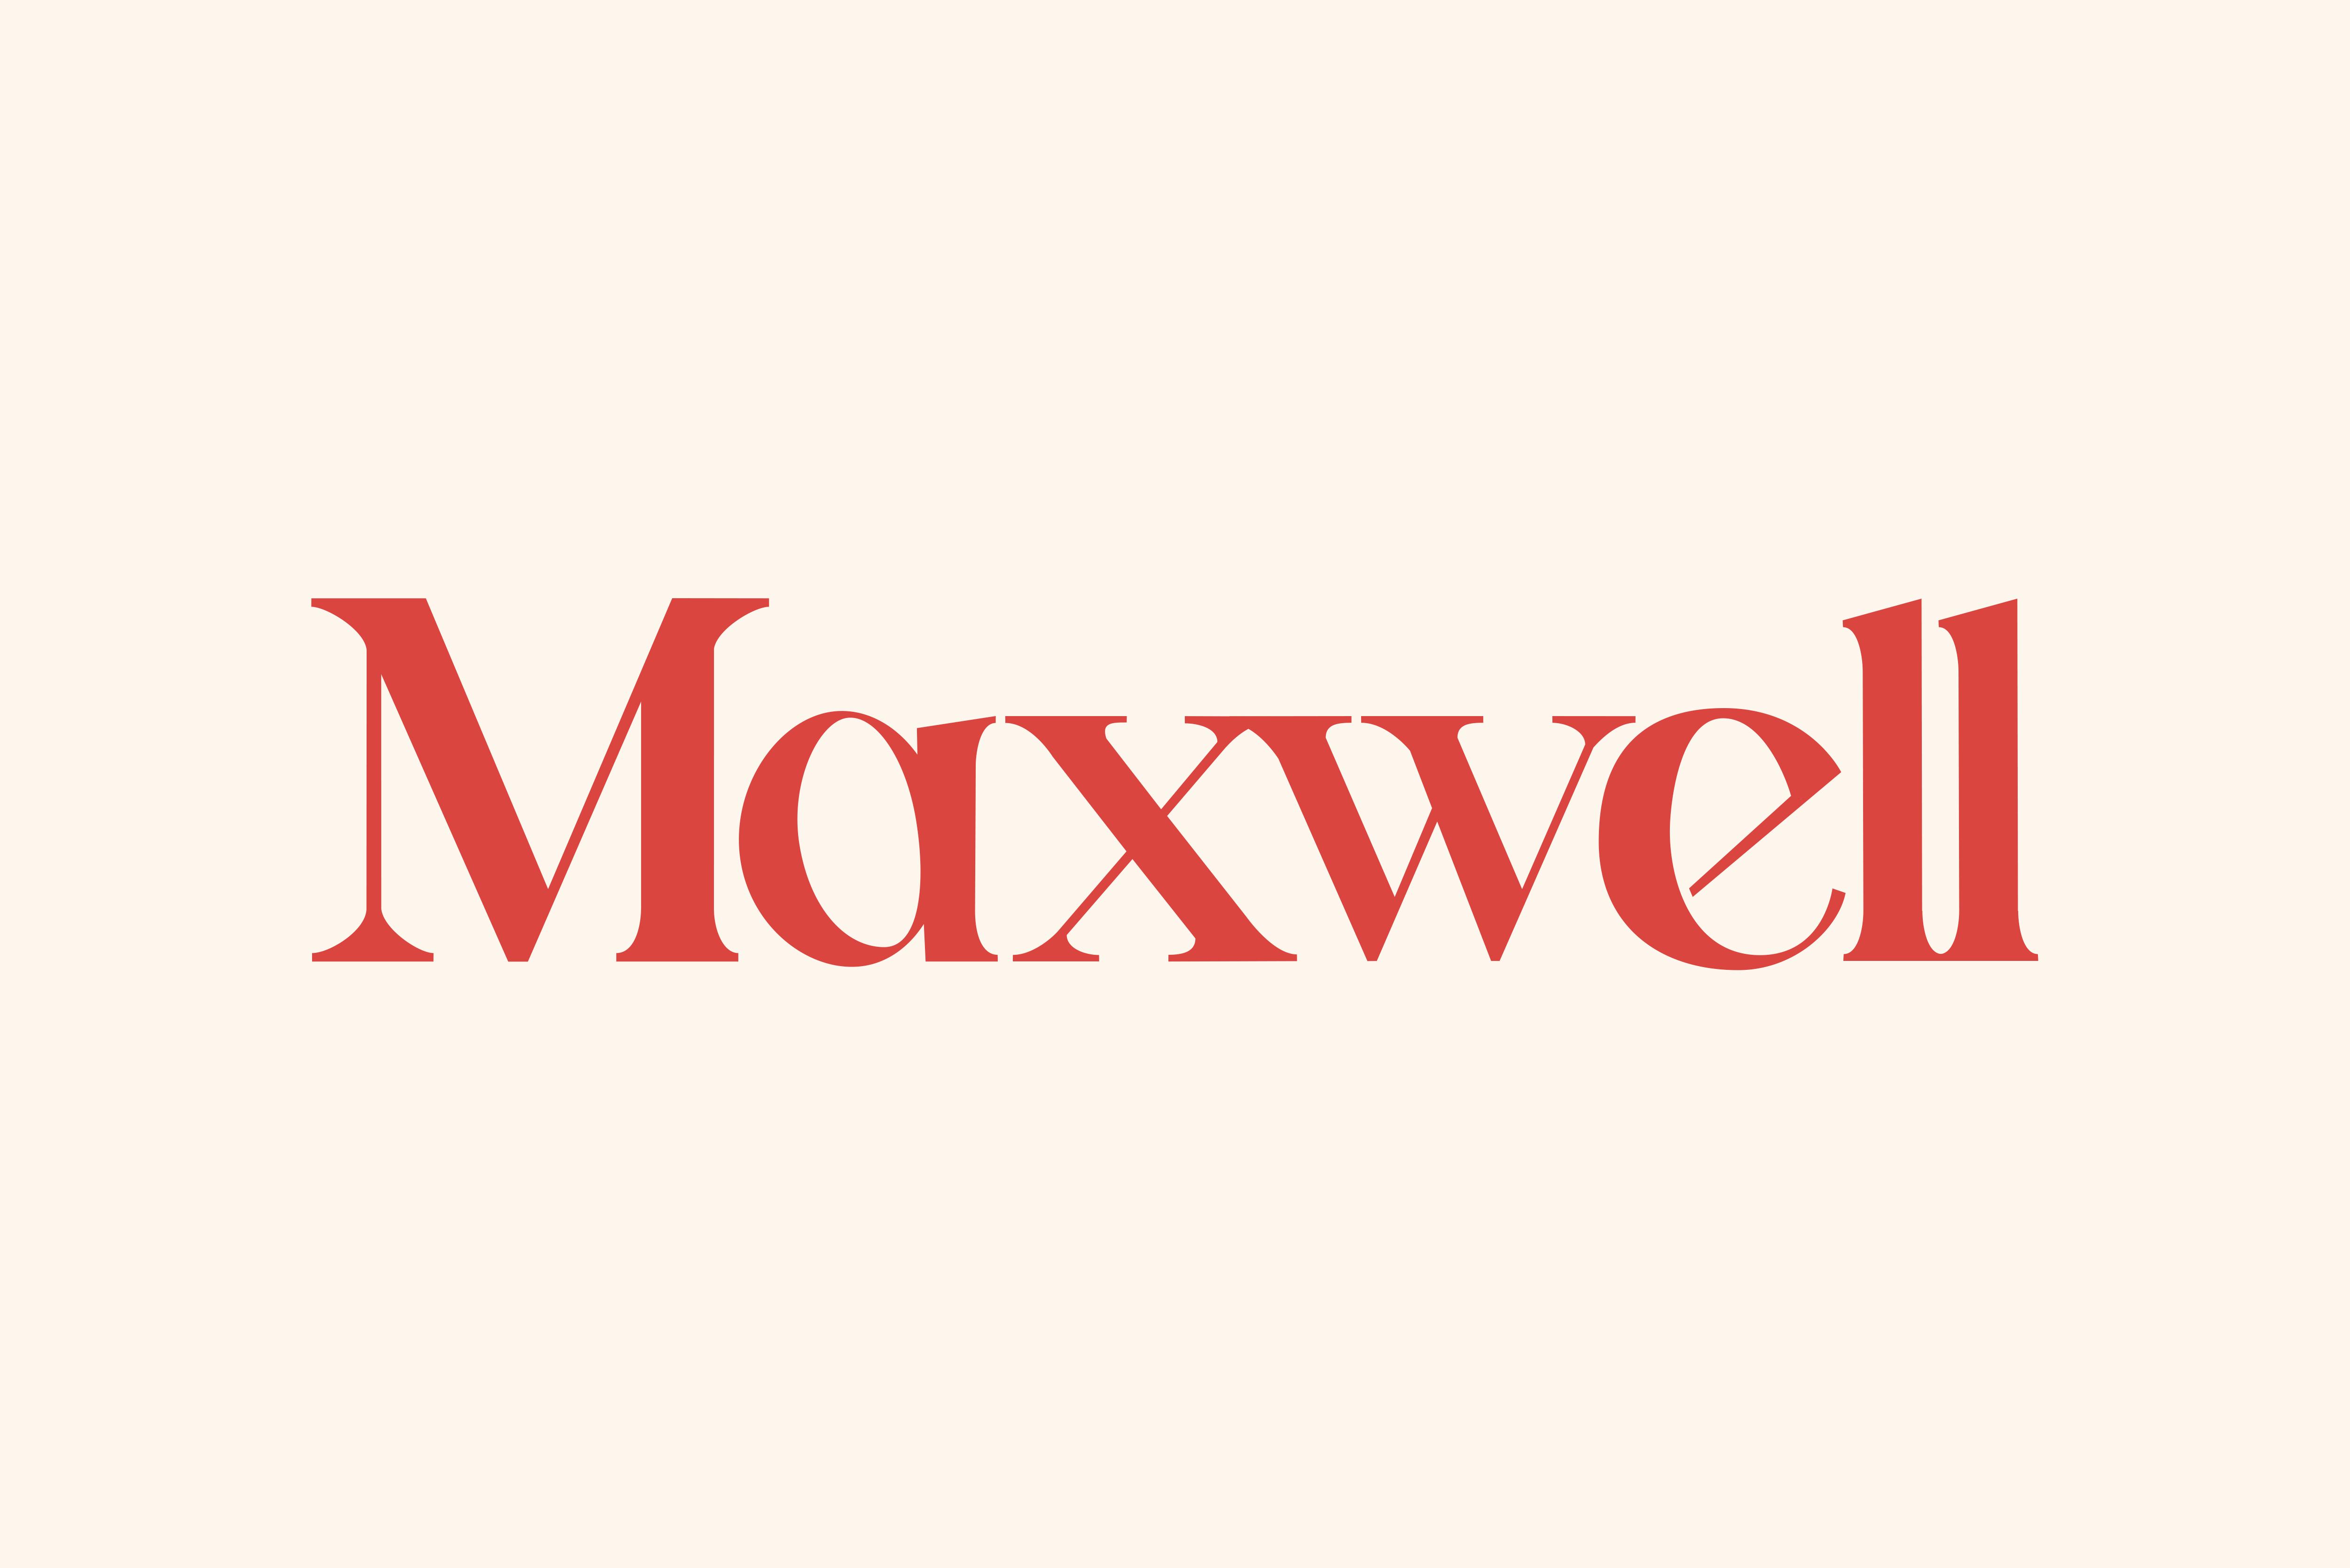 Maxwell-Logos-1